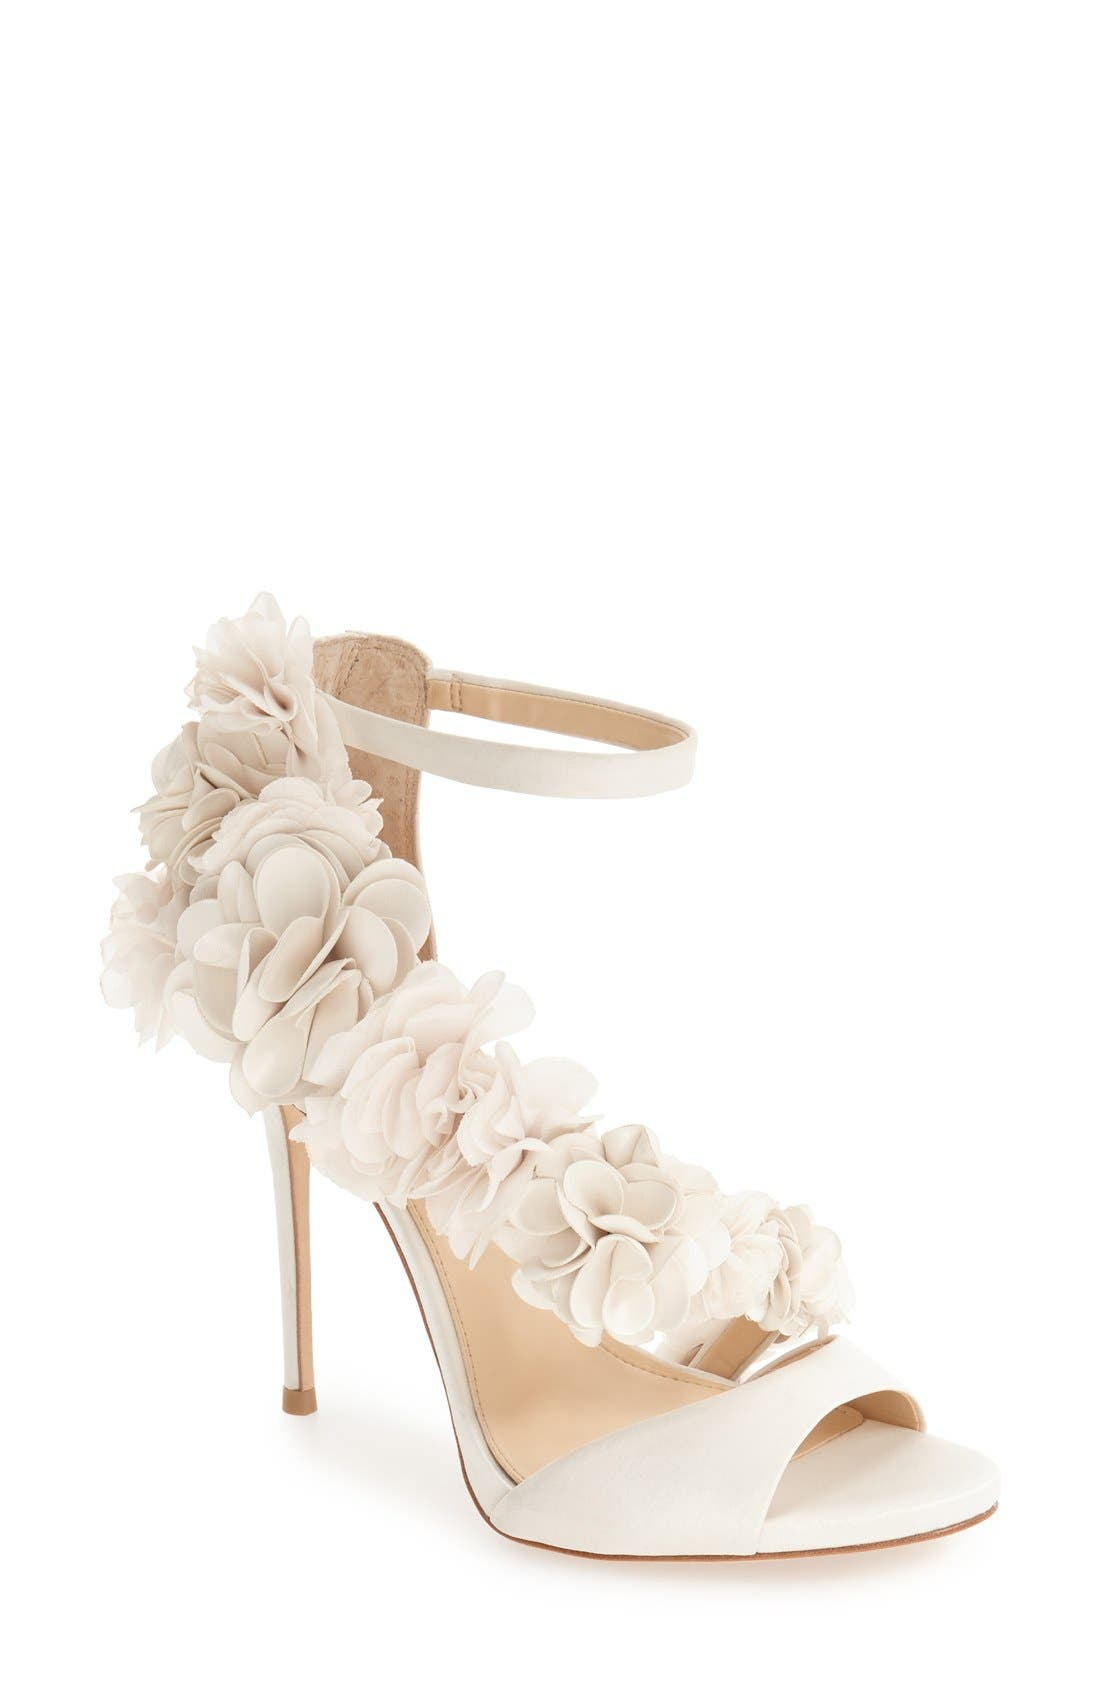 Alternate Image 1 Selected - Imagine by Vince Camuto 'Daphne' Floral Ankle Strap Sandal (Women)